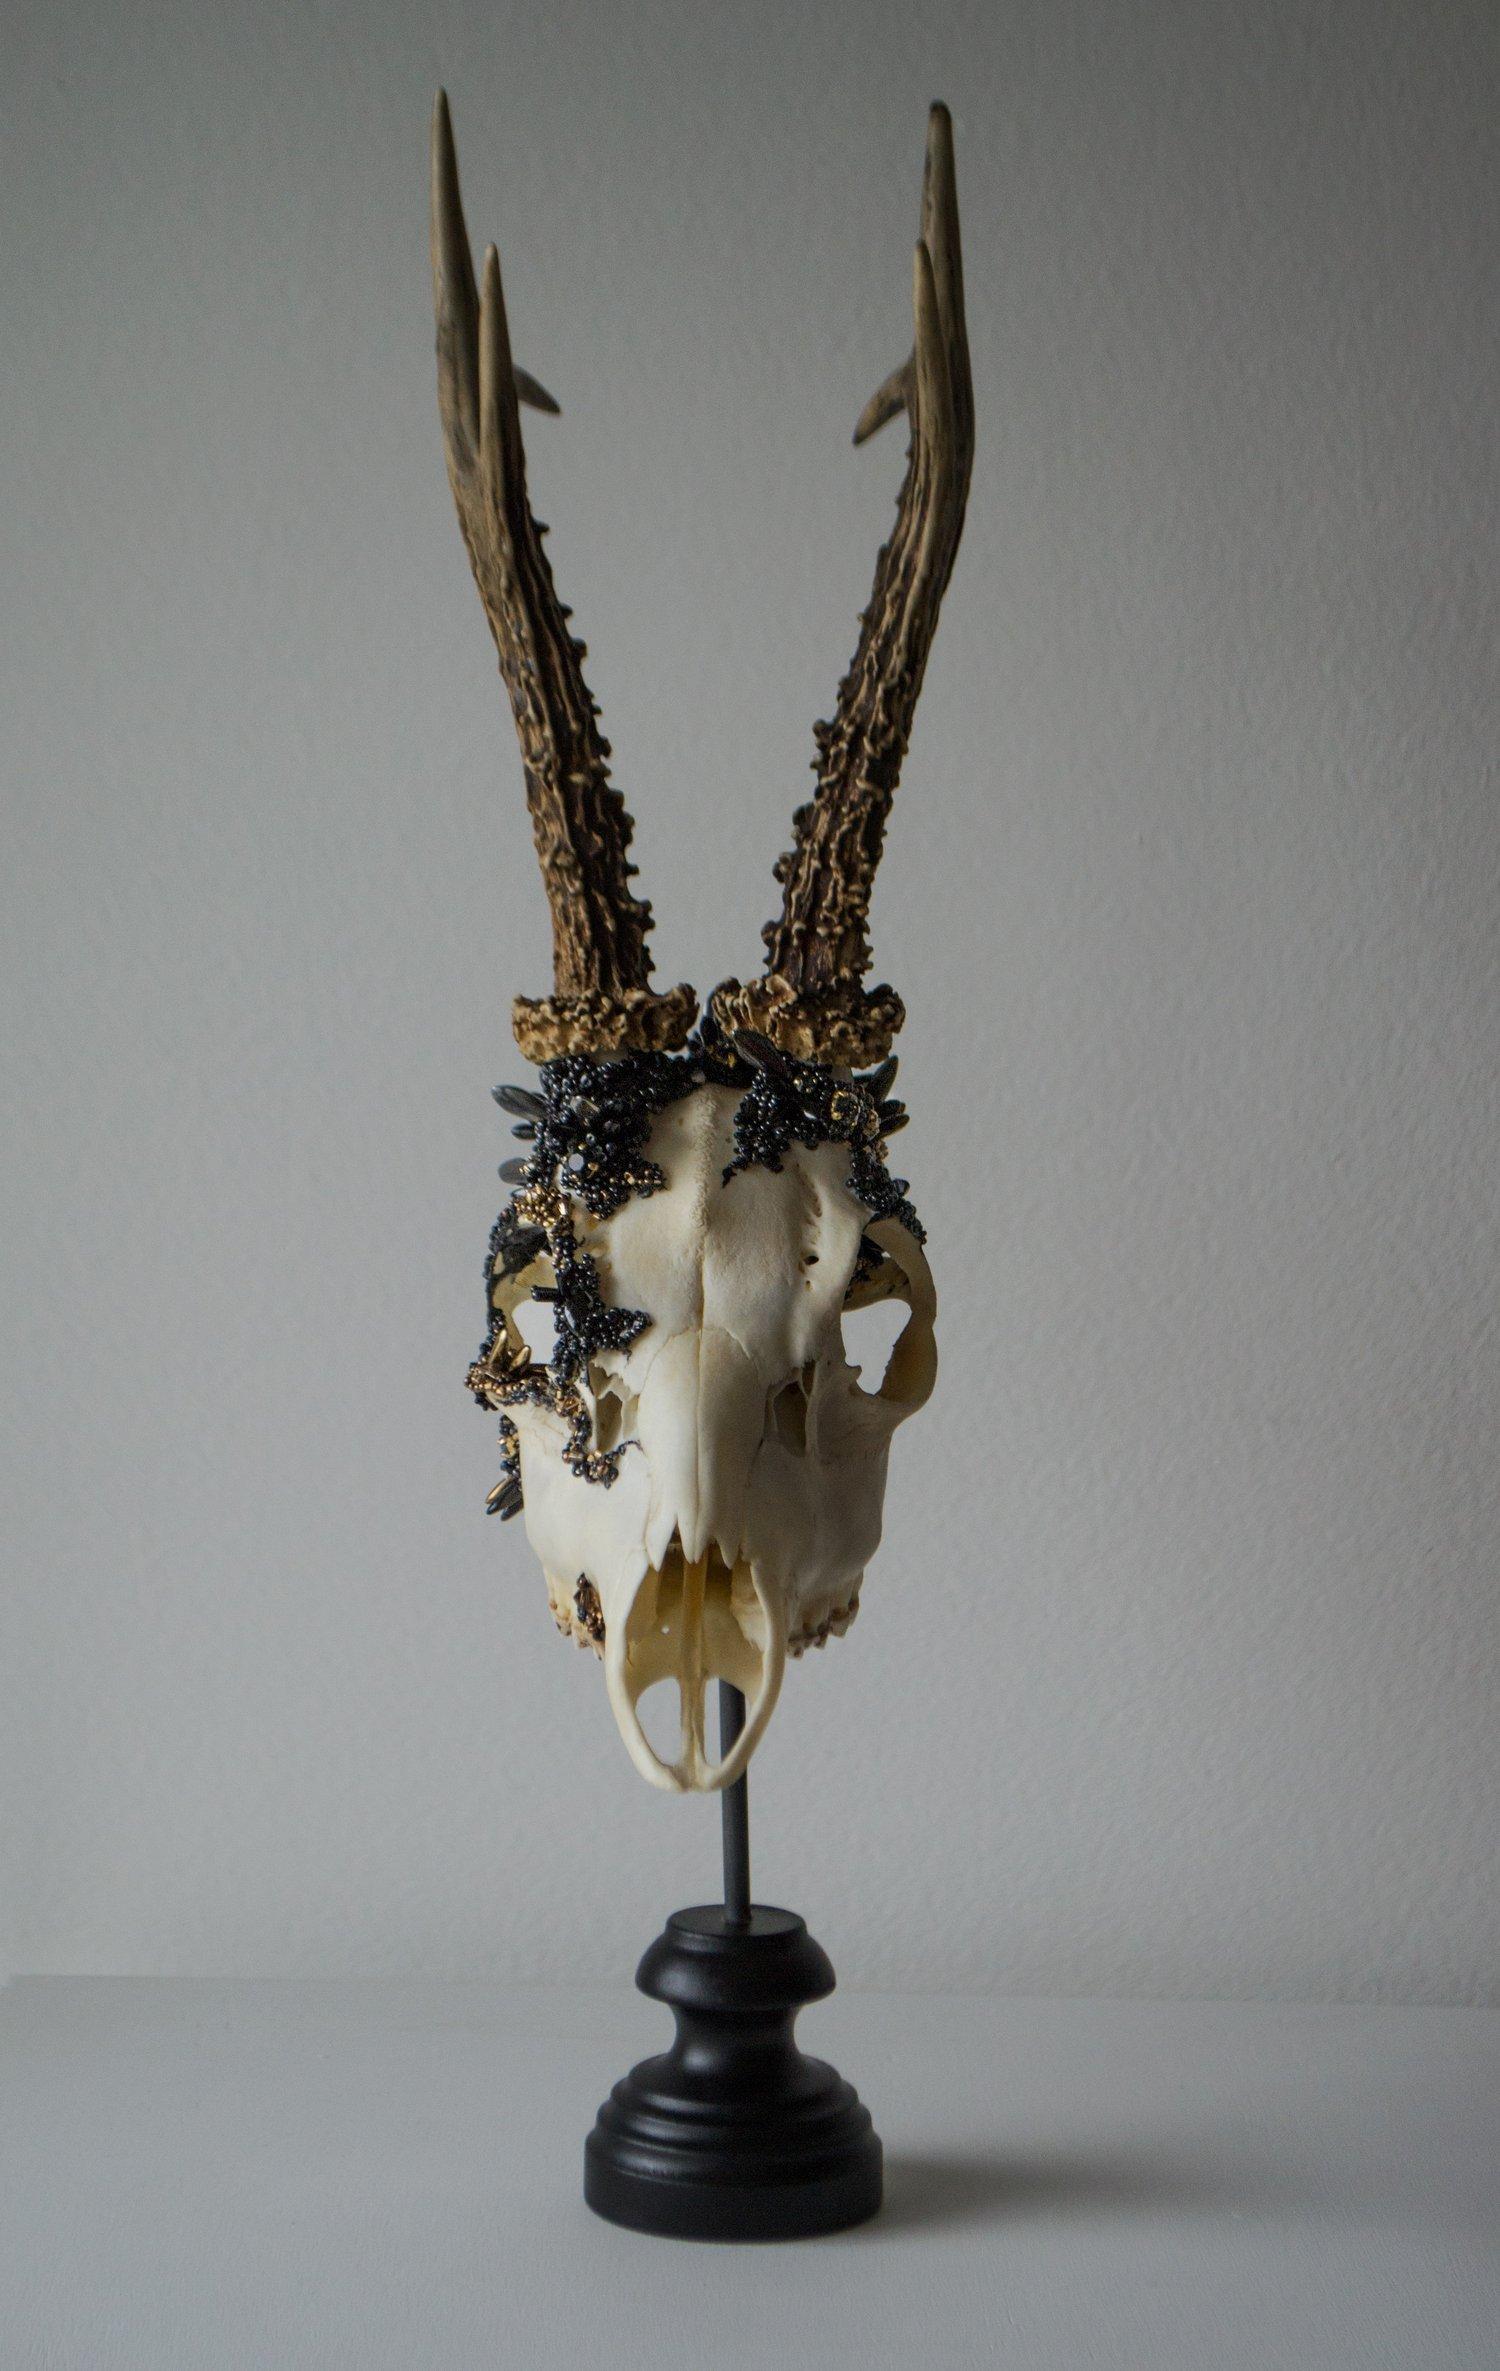 Image of Crystallized Skull #2